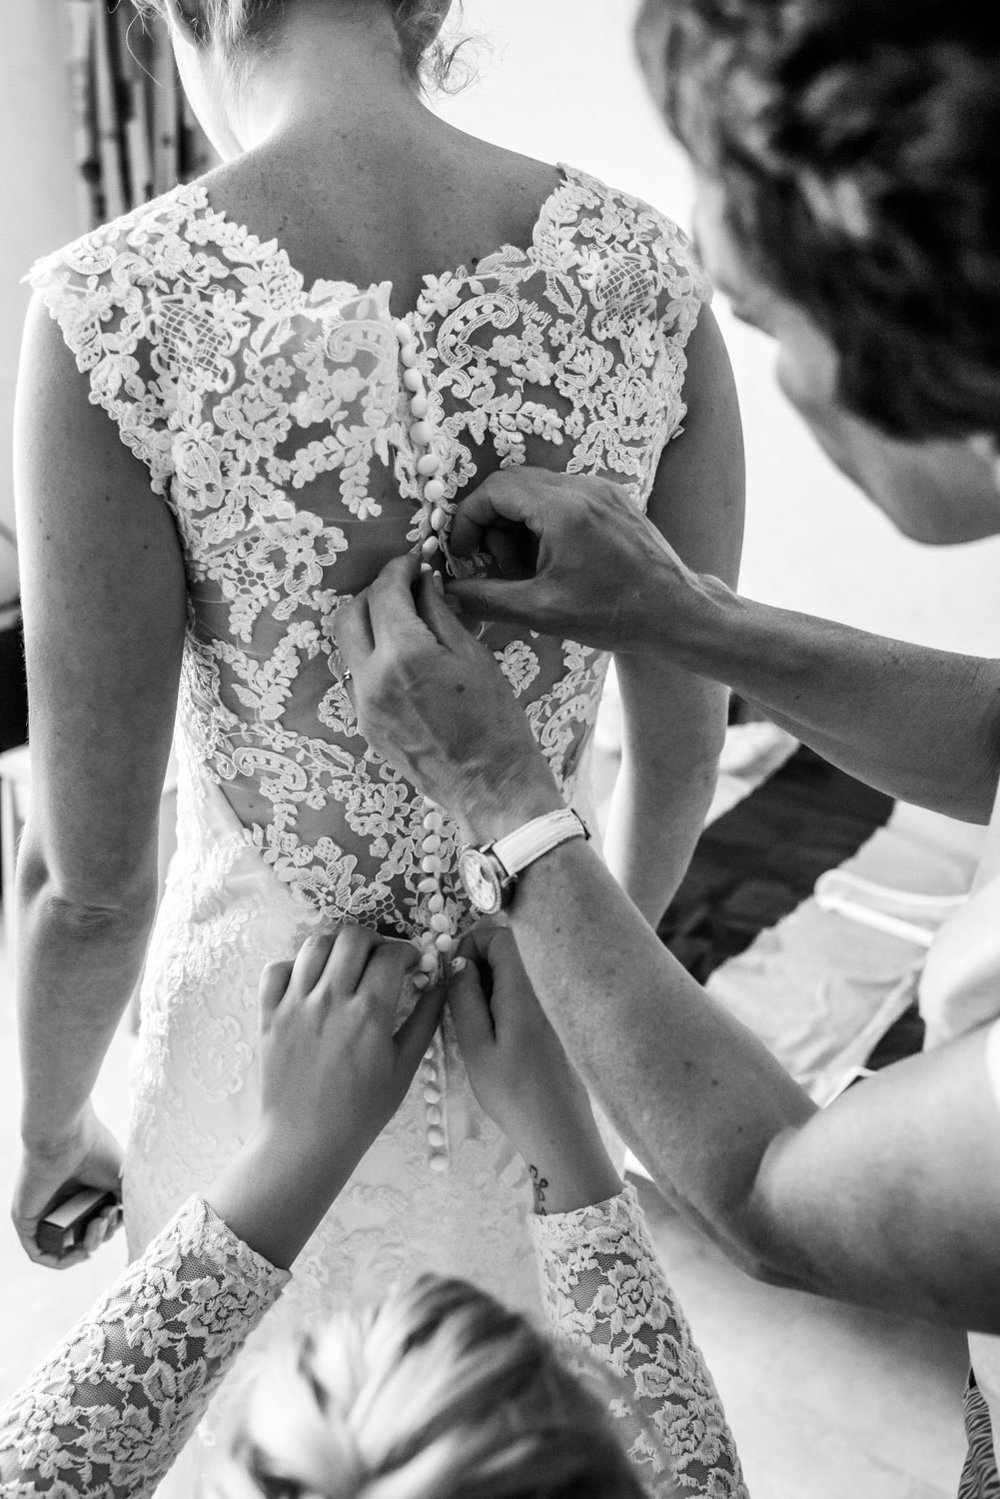 knoopjes bruidsjurk, Rotterdam, vastmaken jurk, trouwfotografie